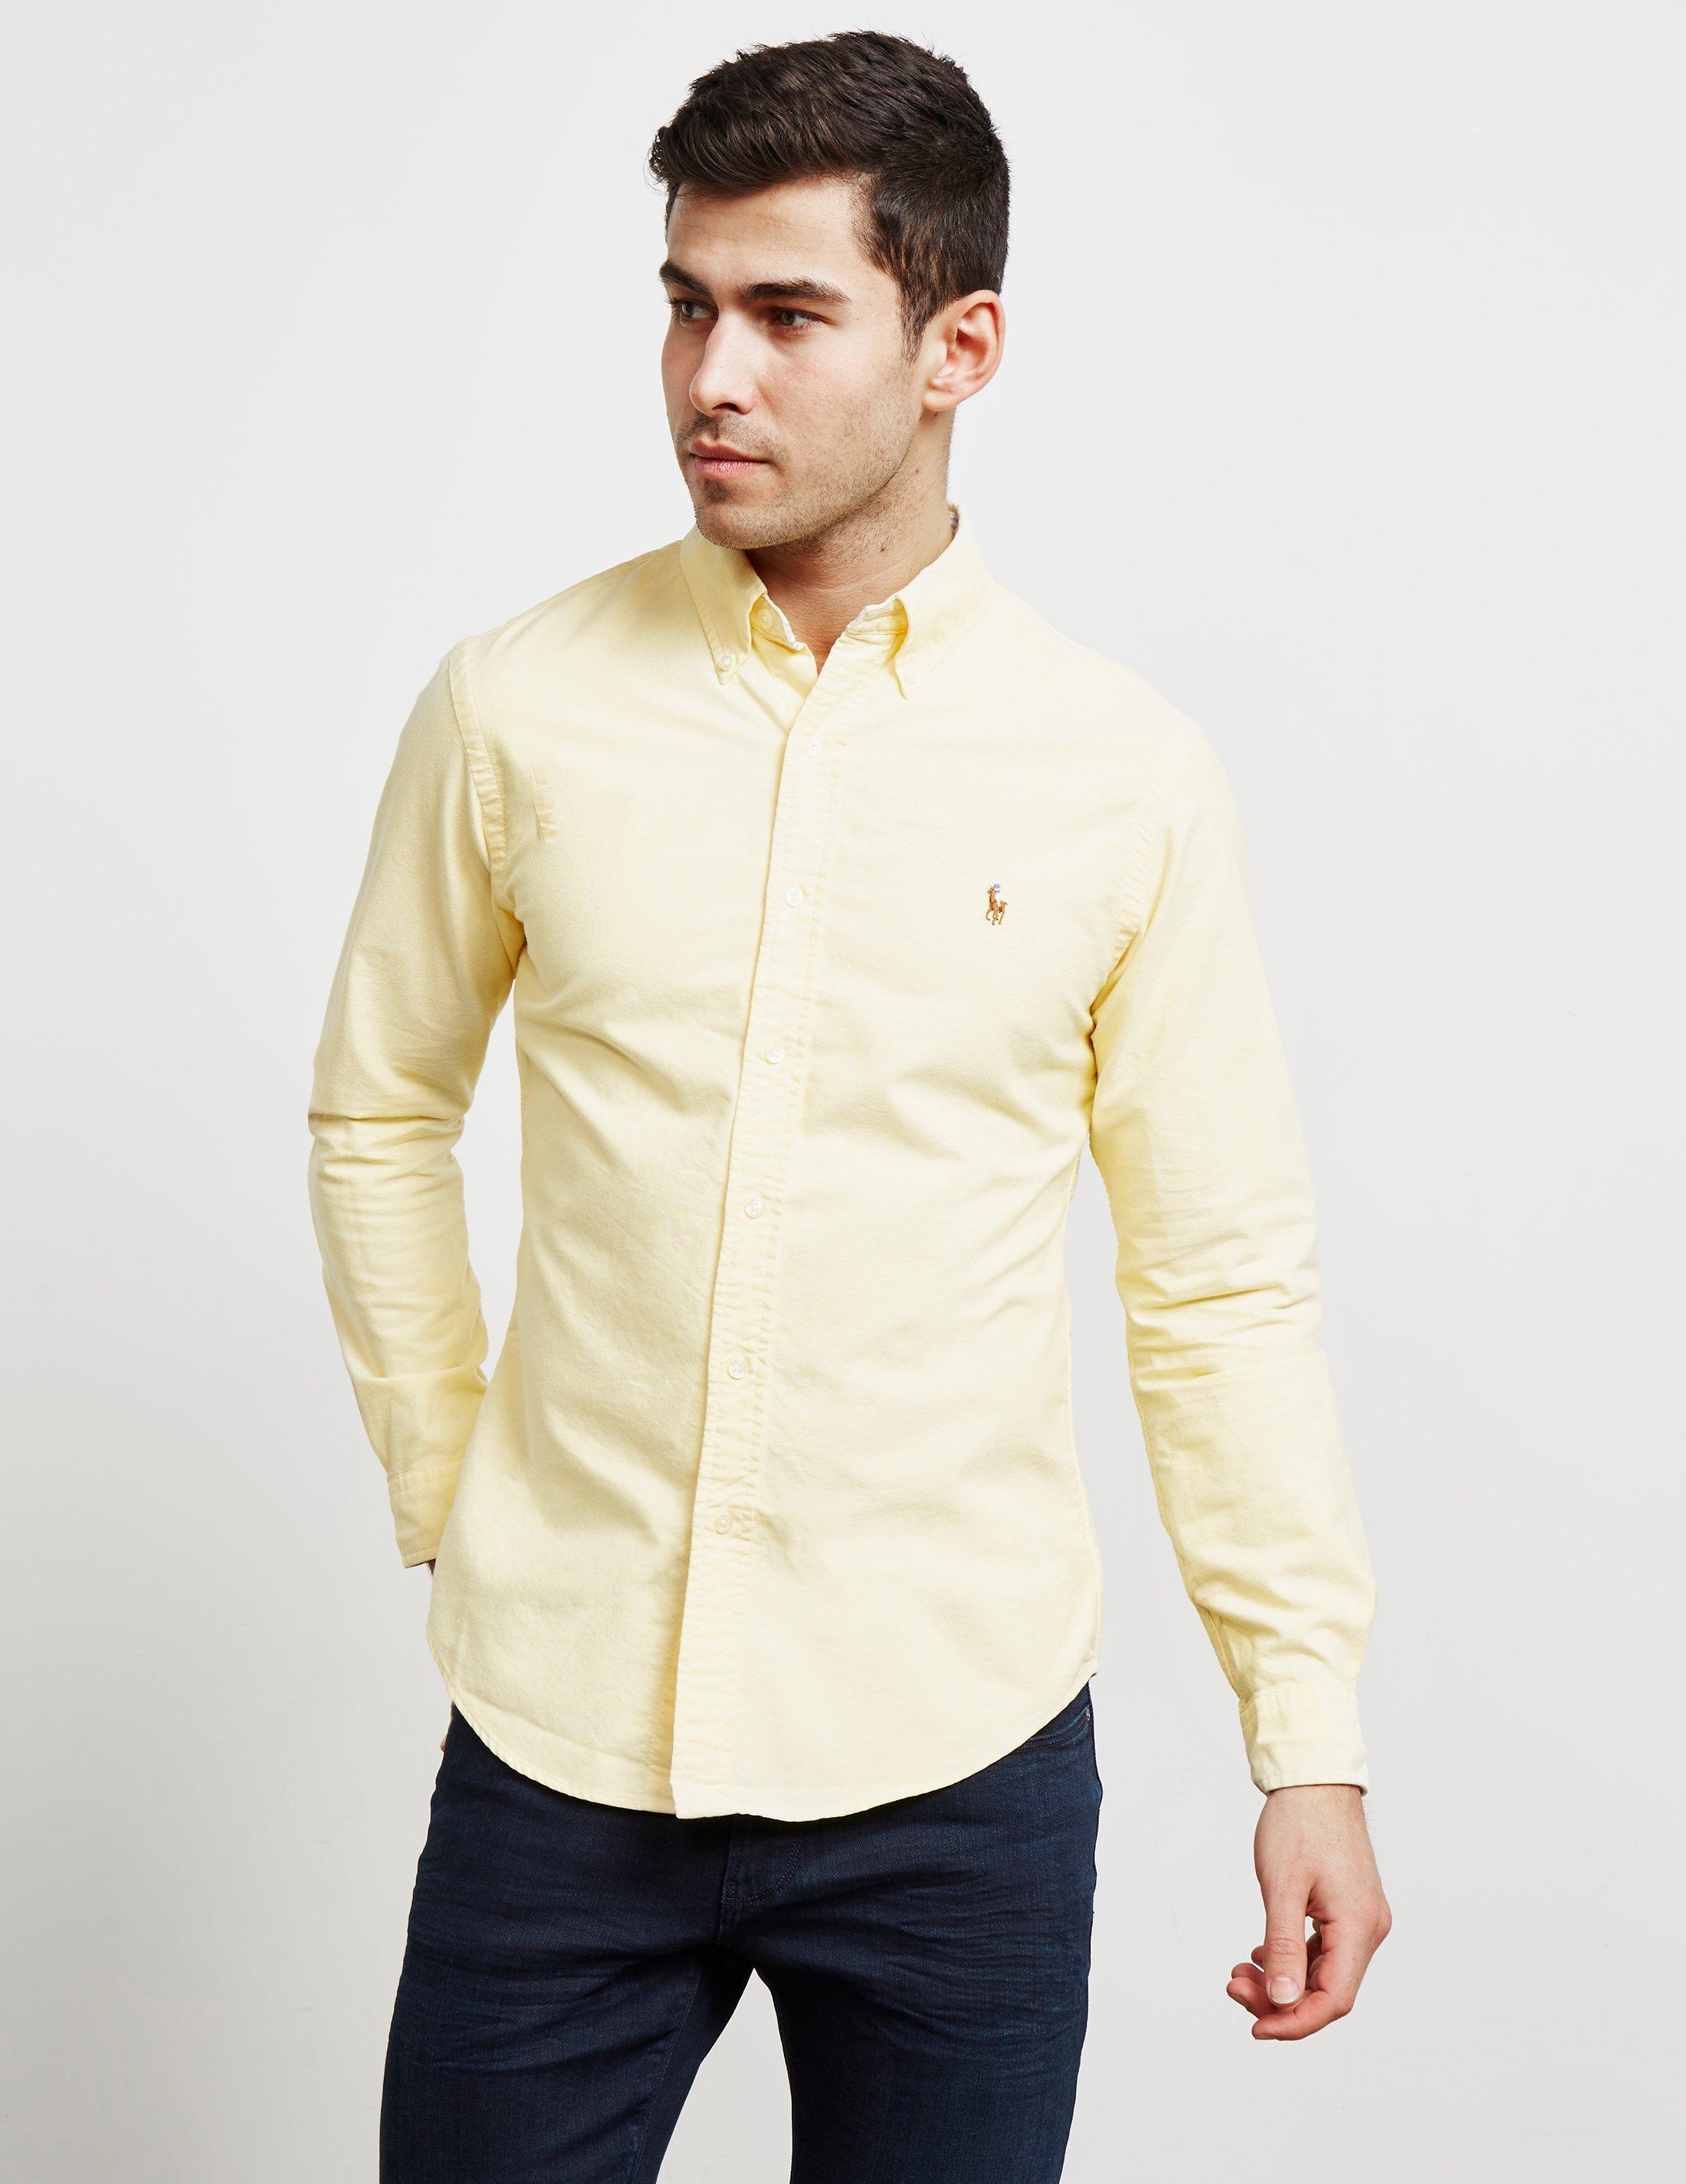 f467755ec3 Polo Ralph Lauren Mens Oxford Long Sleeve Shirt Yellow in Yellow for ...